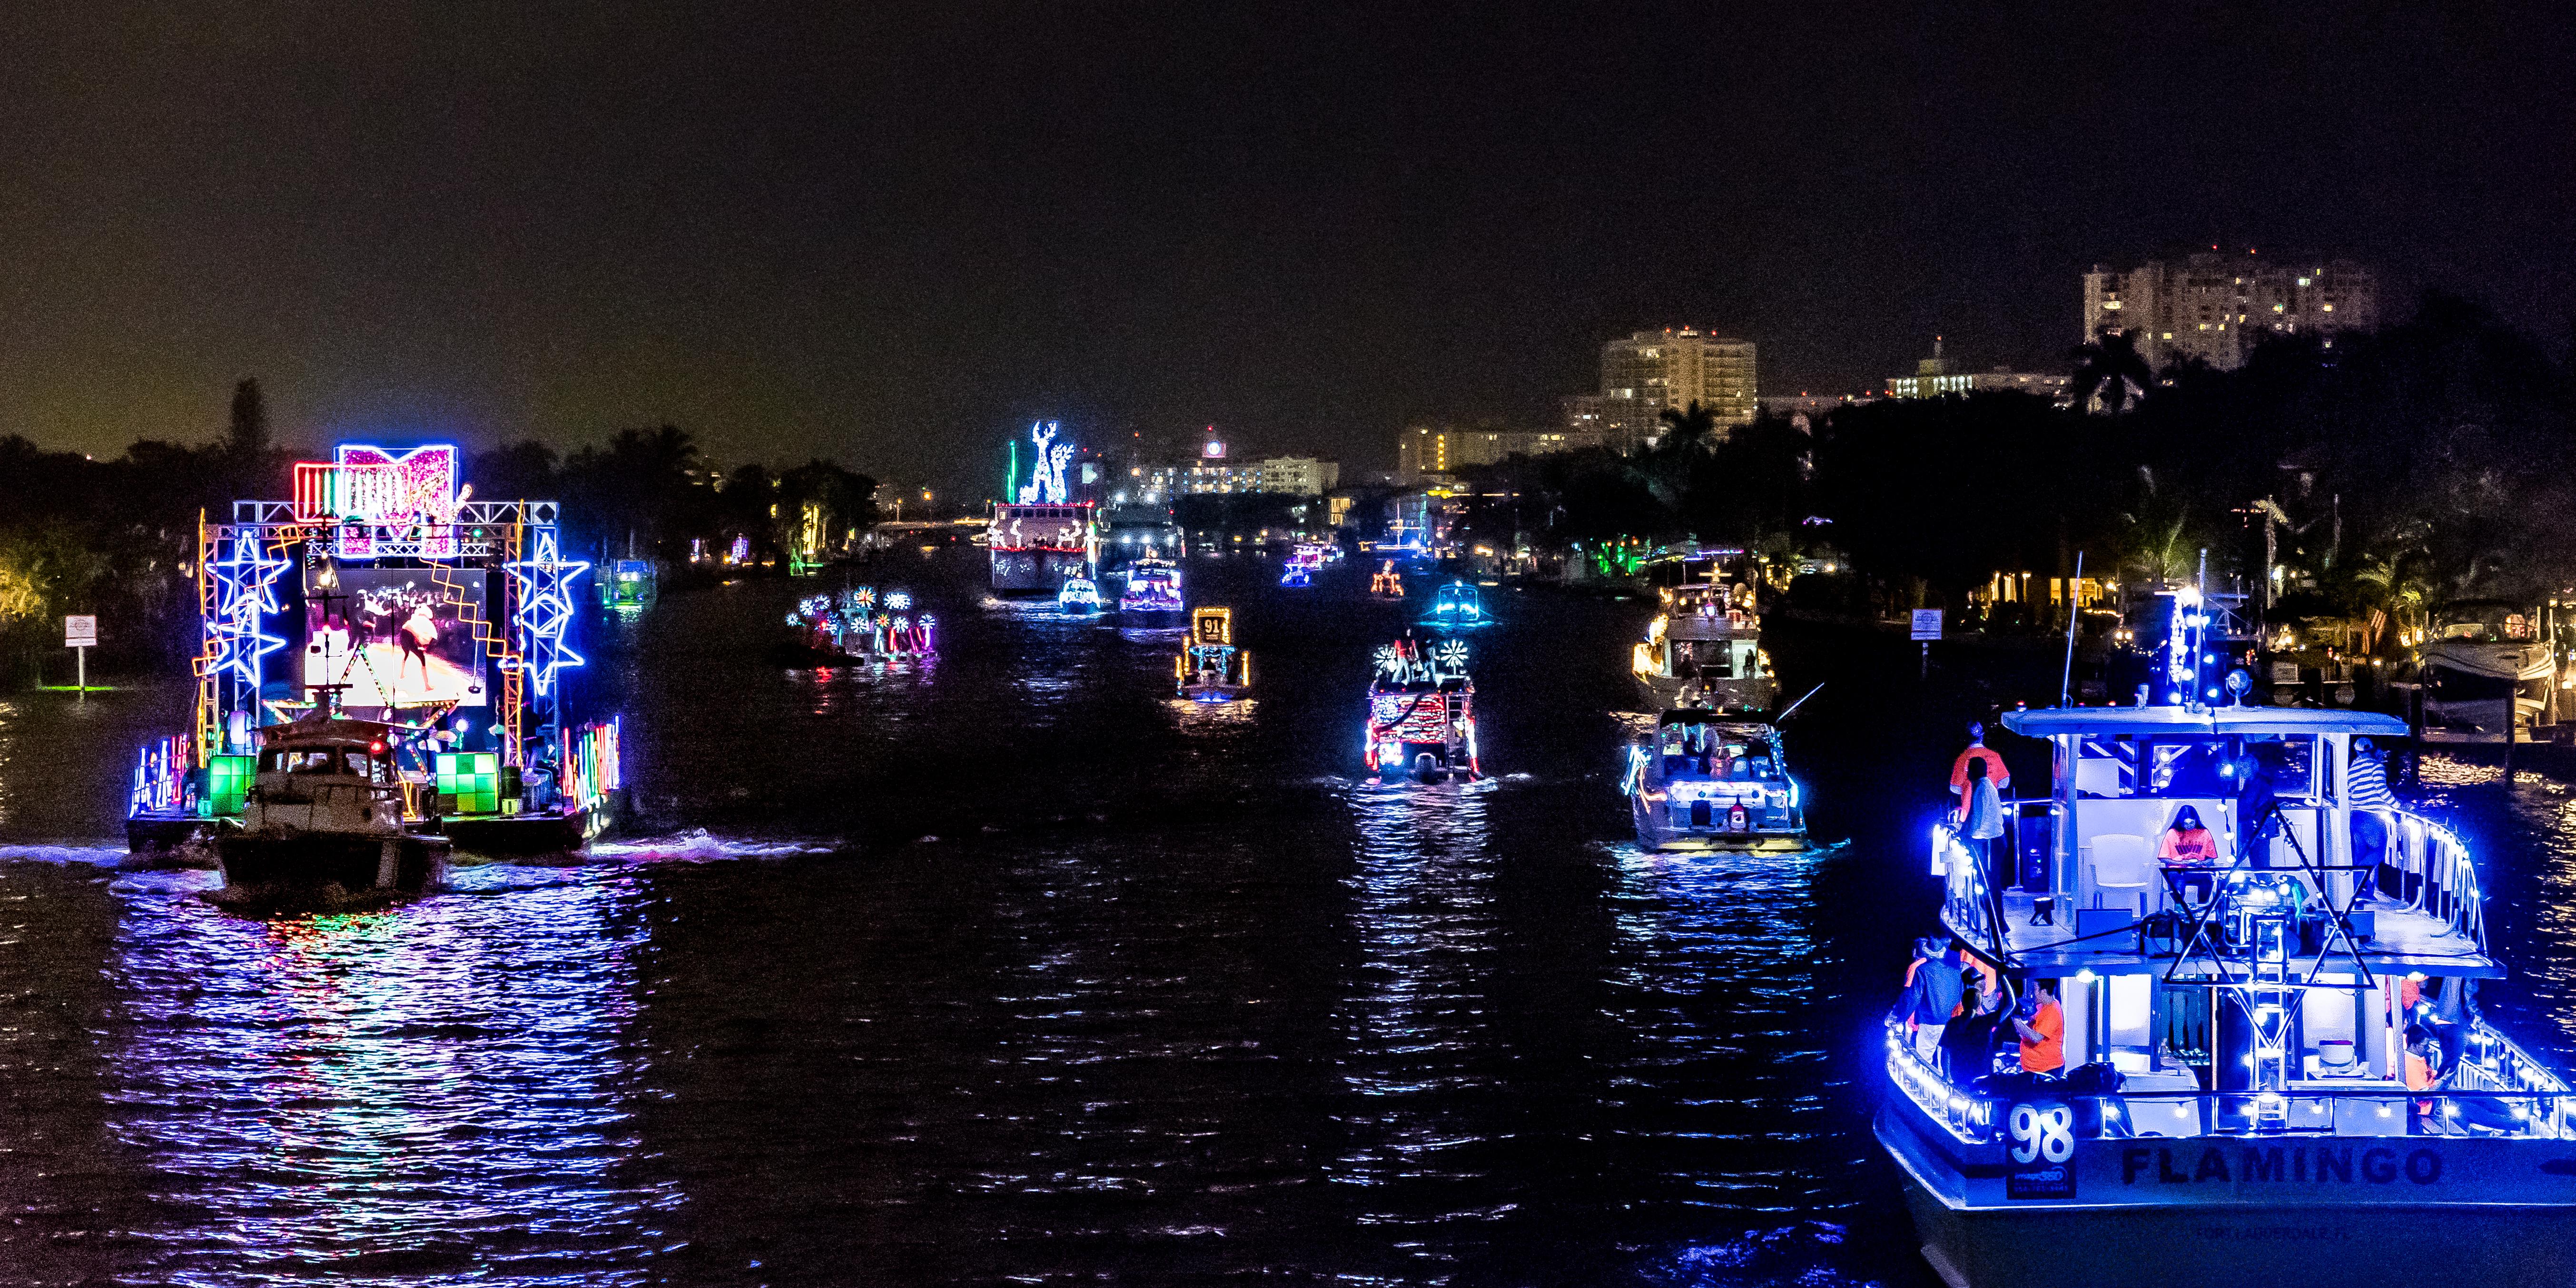 casino boat for sale in florida